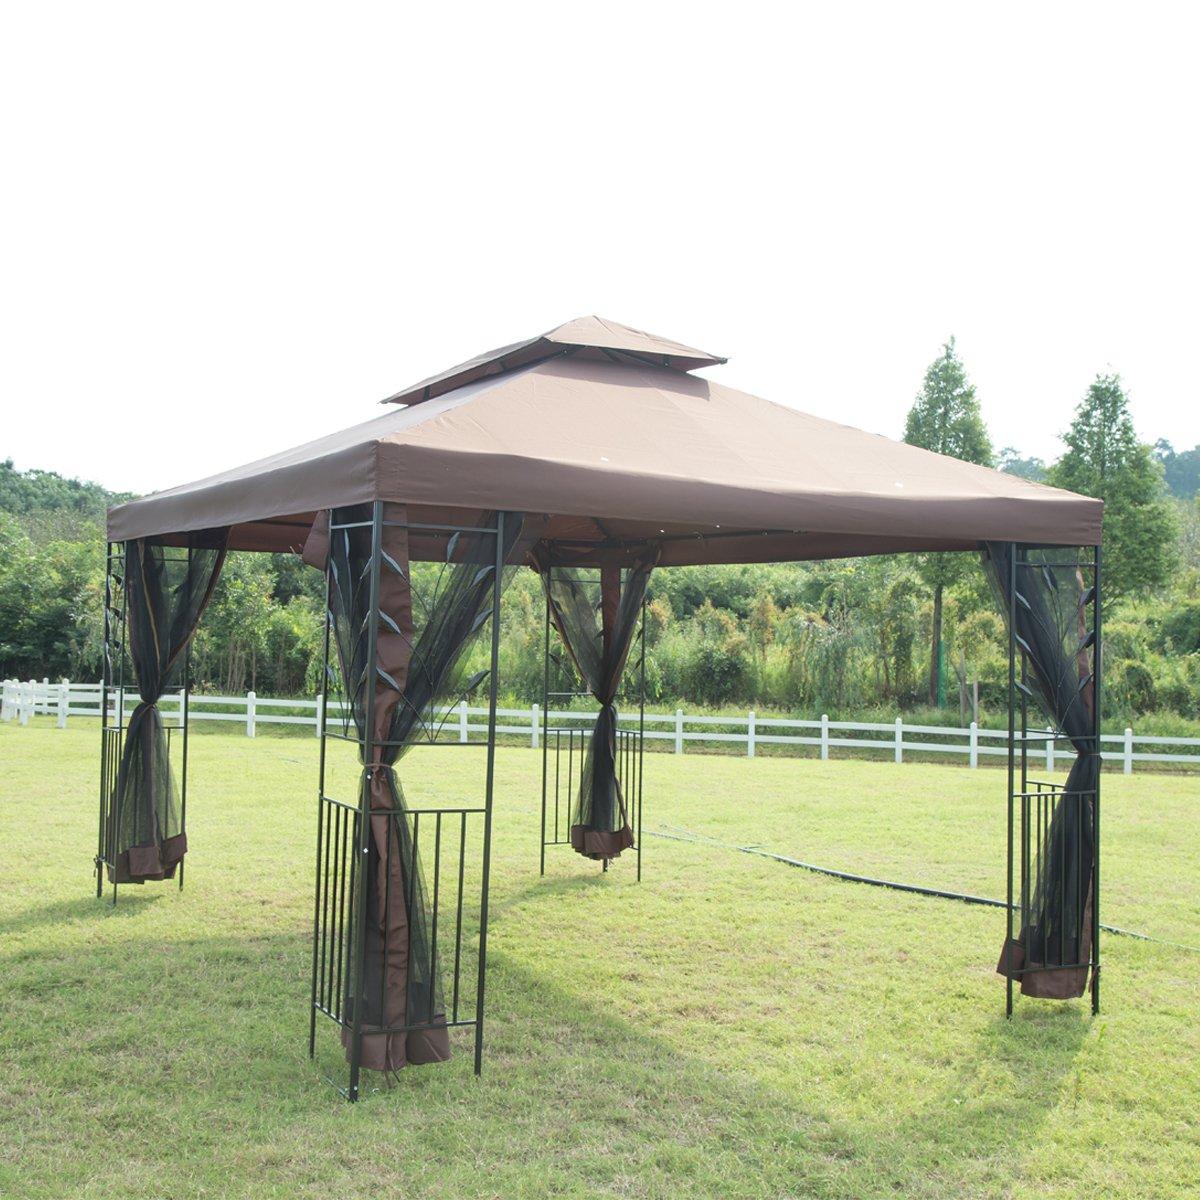 10'x 12' Outdoor Garden Gazebo Patio Canopy Party Gazebo with Netting Screen Walls